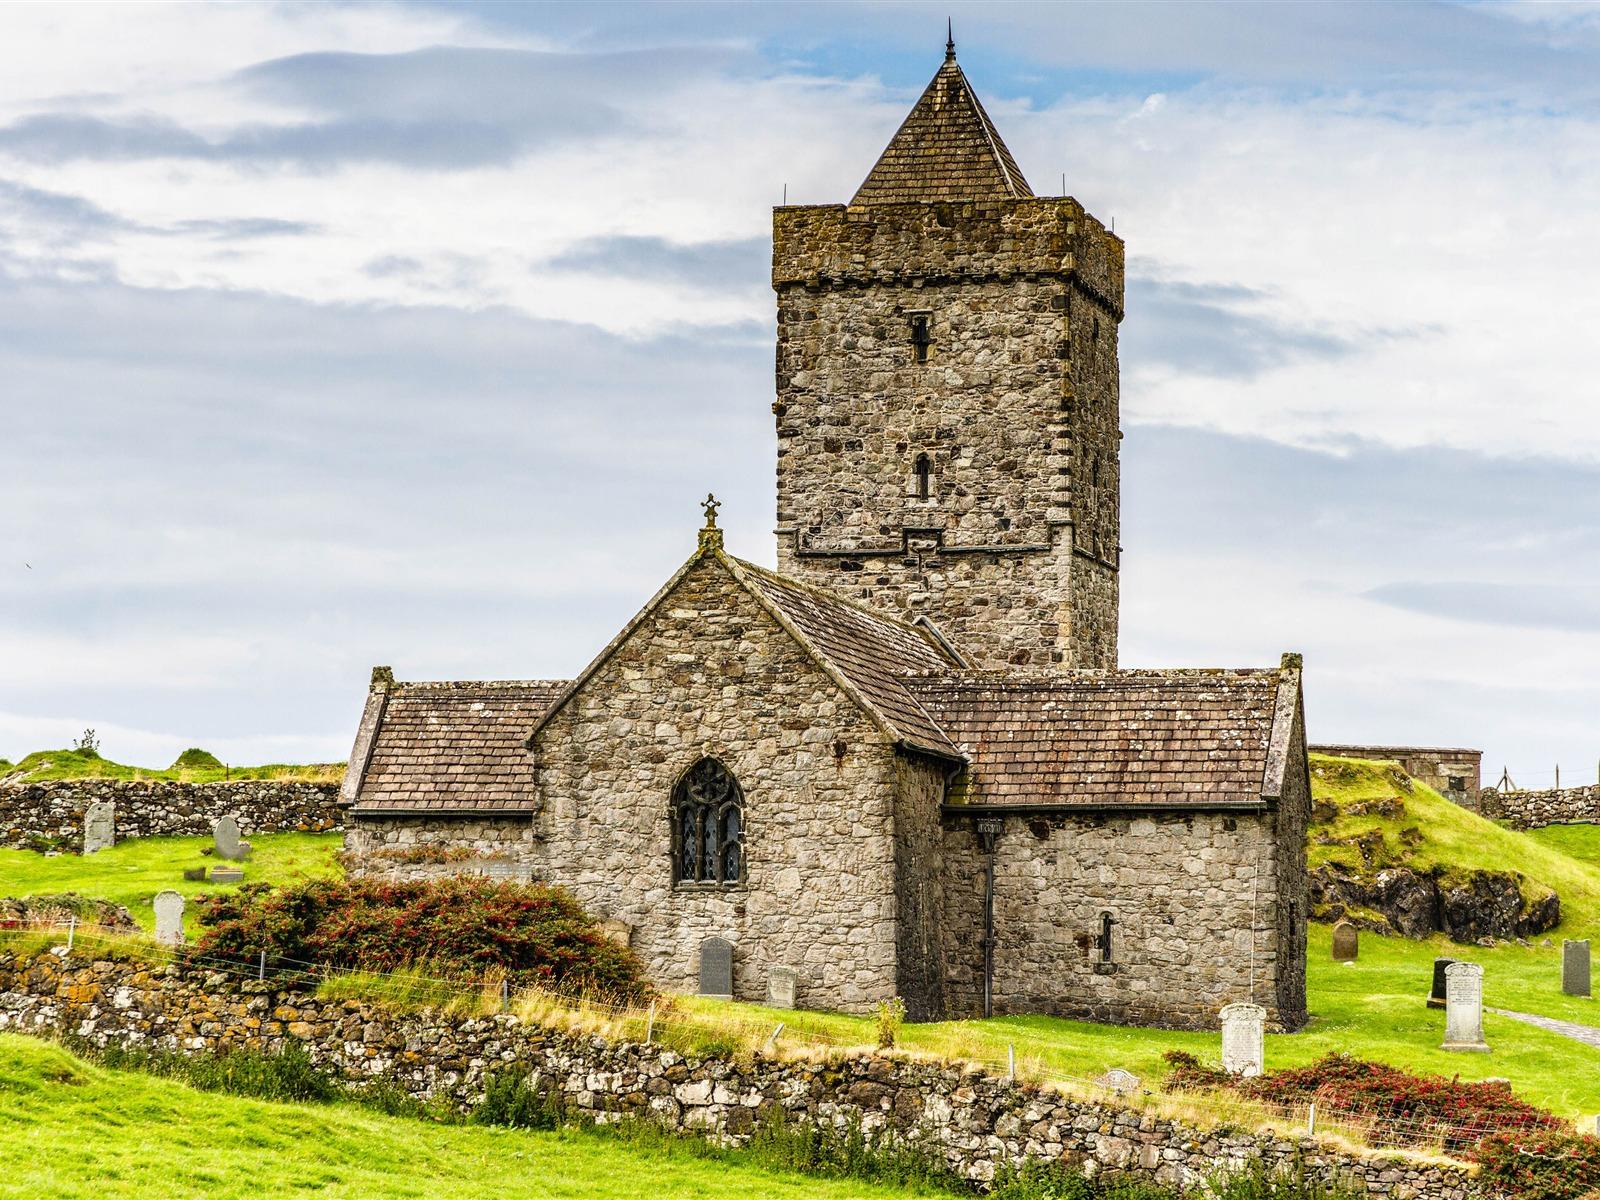 European Countryside Stone Houses 2017 4k High Quality